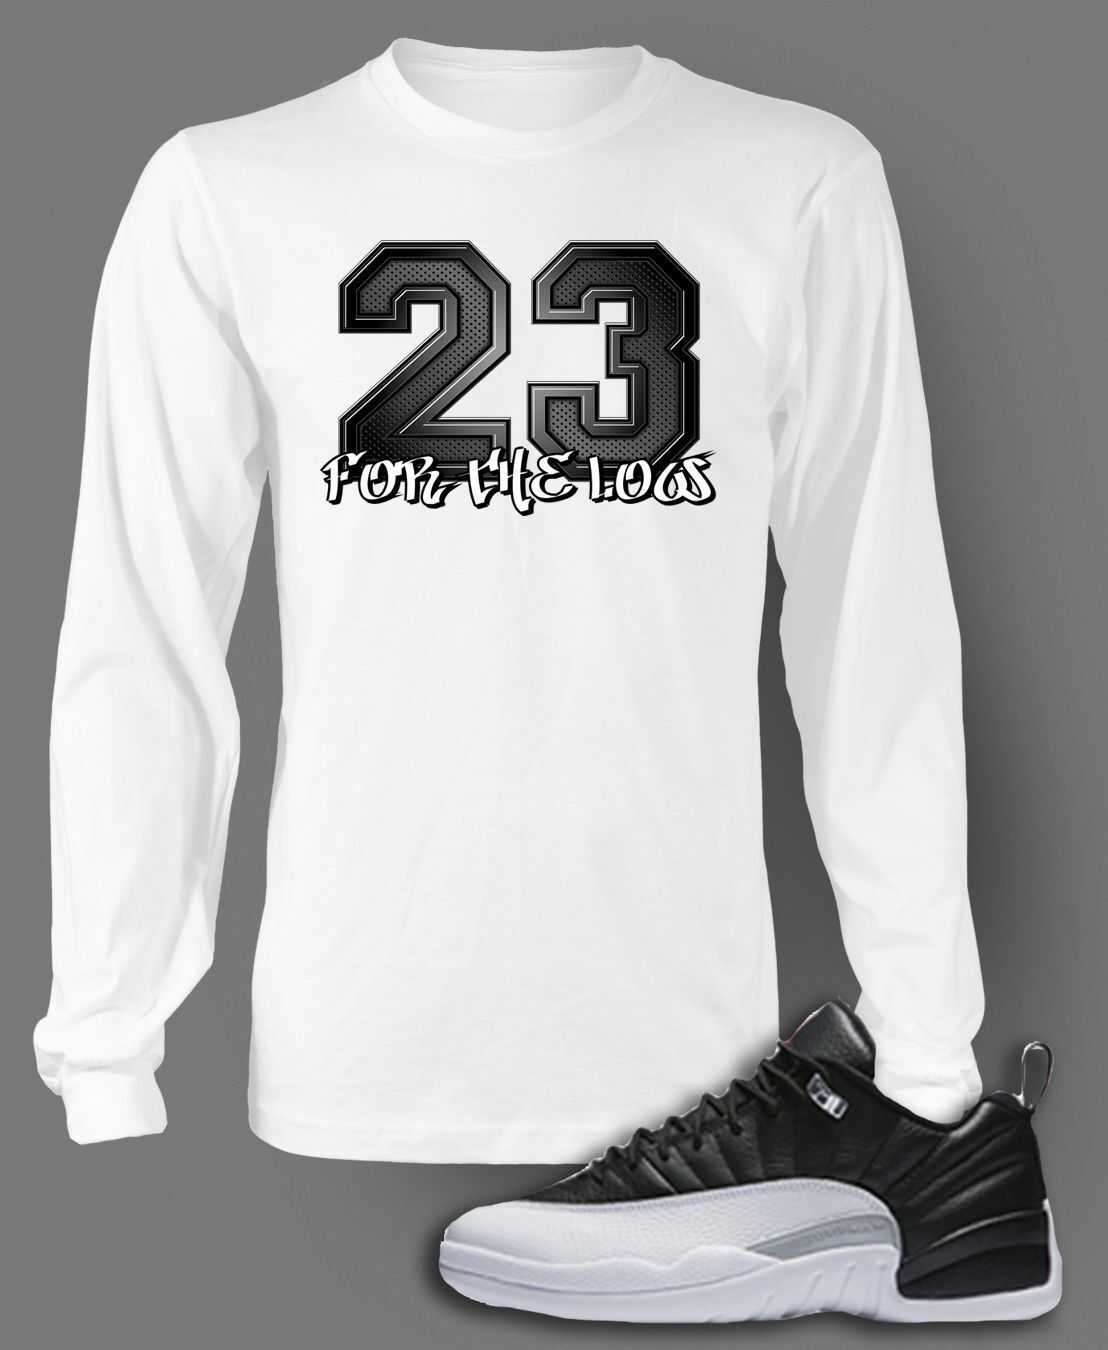 b16d38a1c4f4 T Shirt to Match AIR JORDAN 12 LOW PLAYOFFS shoes Pro Club Graphic White  Tee LS